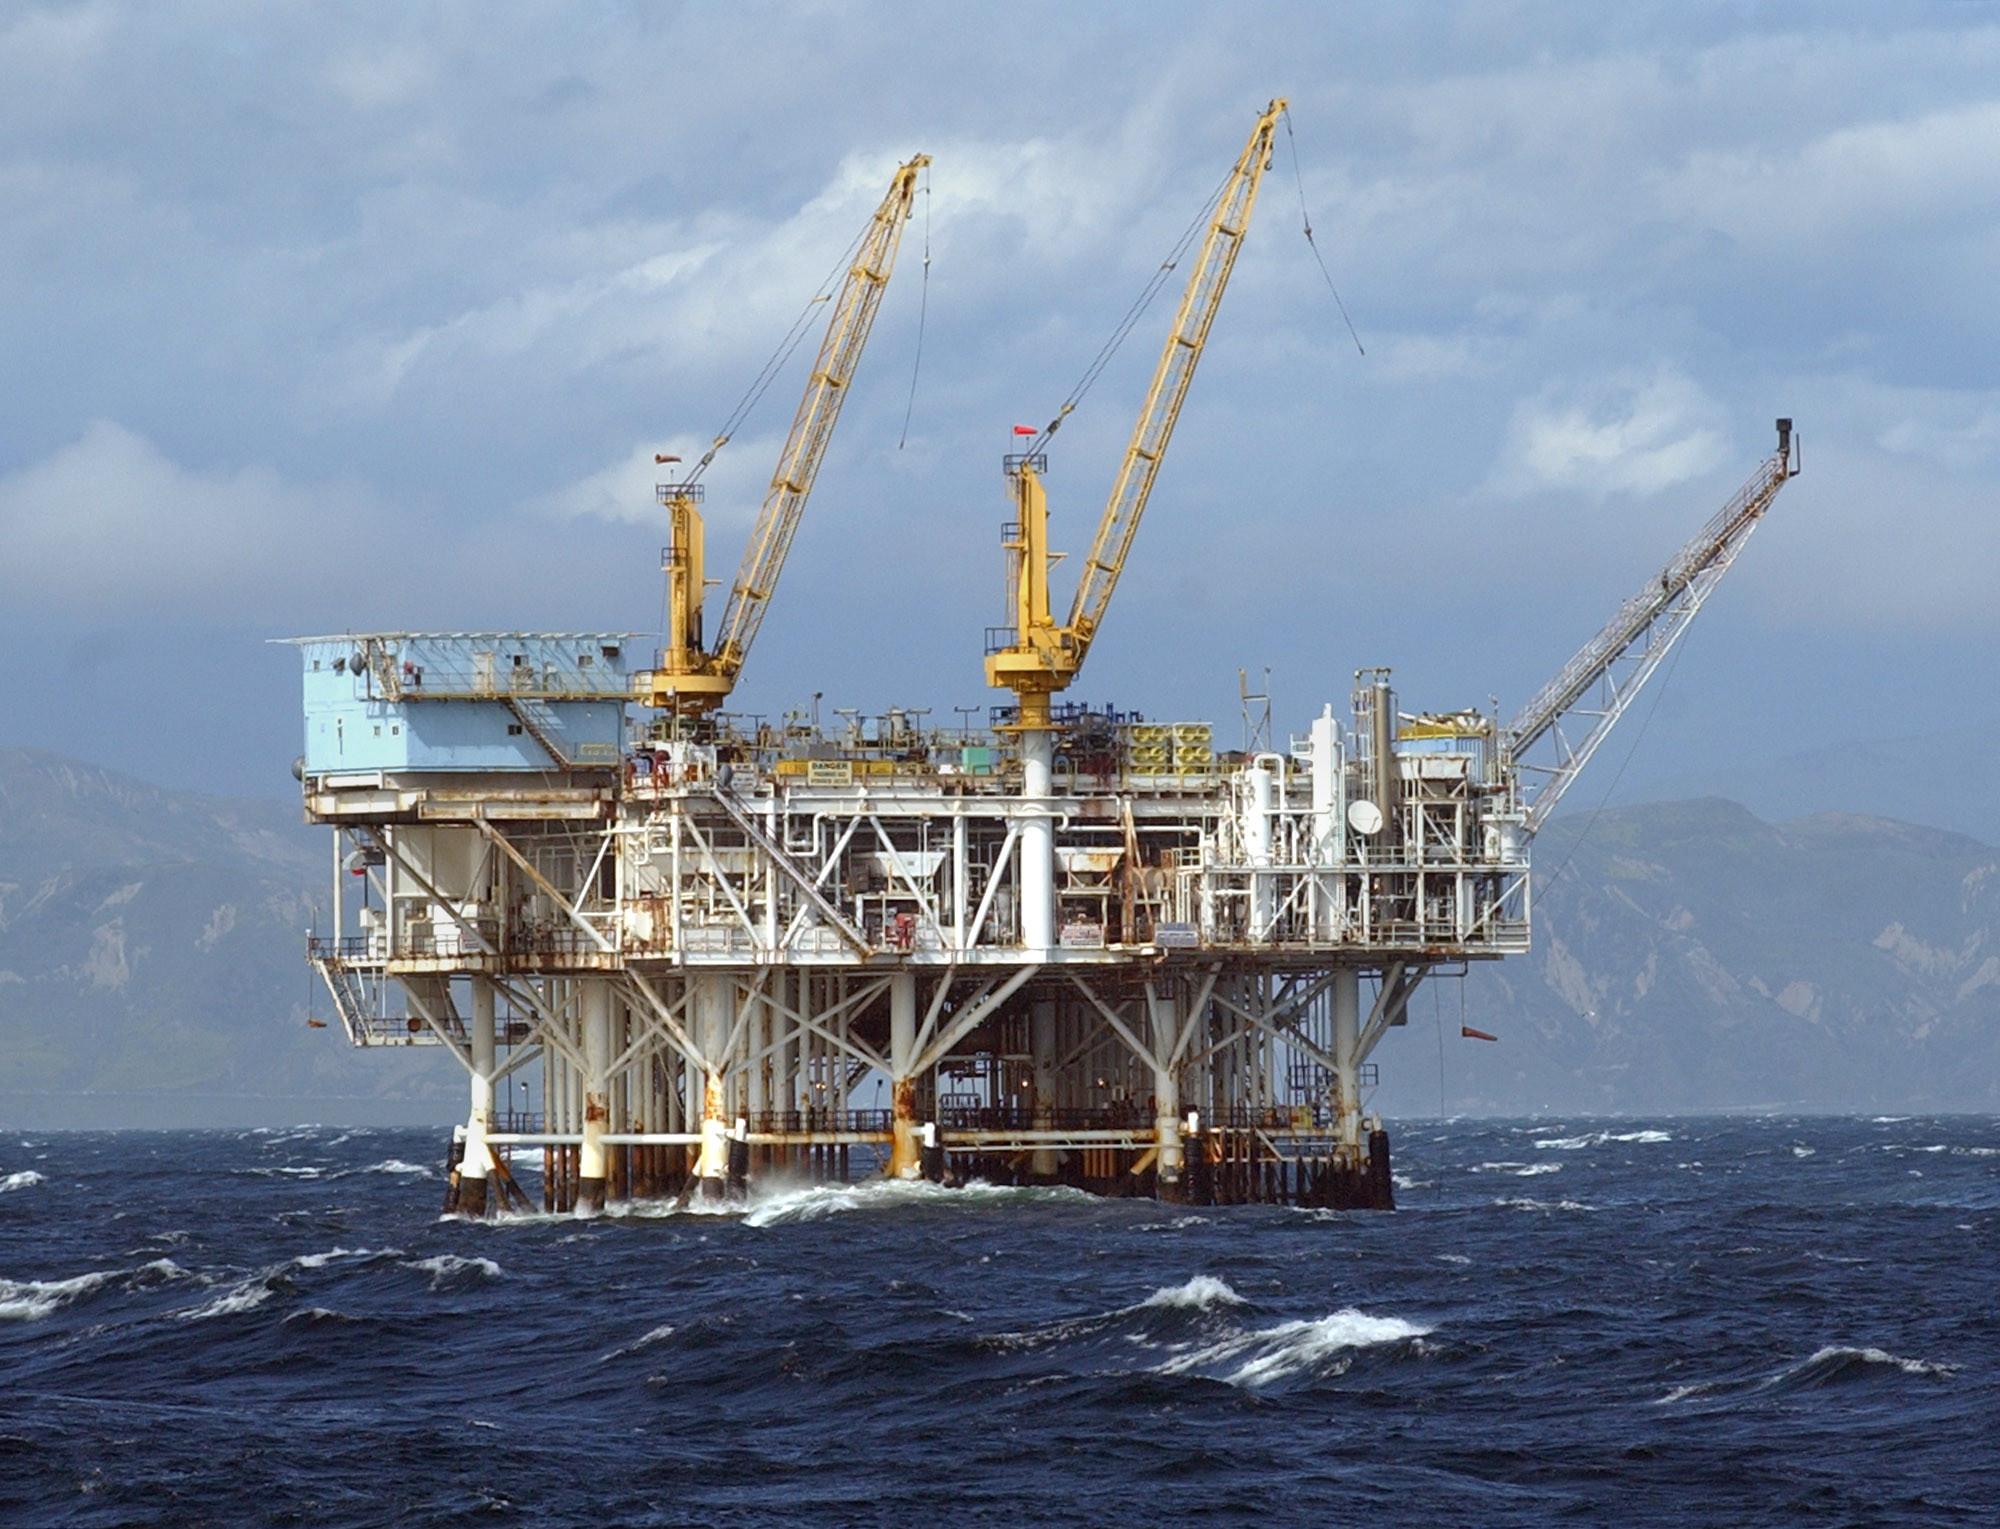 California Offshore Oil Platforms : The good news about offshore oil rigs california